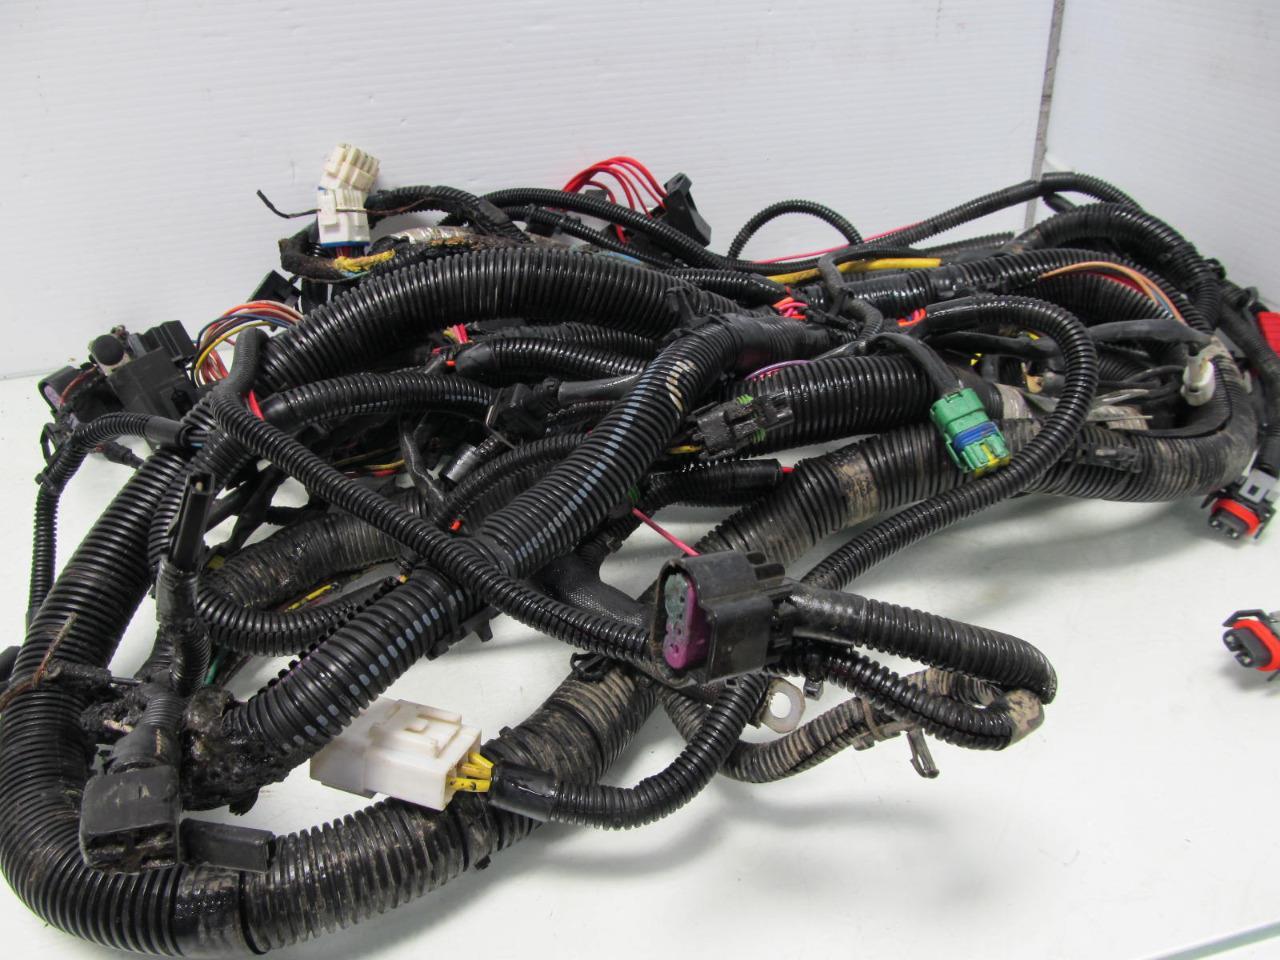 John Deere Gator Rsx850i Rsx 850i 2012 12 Main Wiring